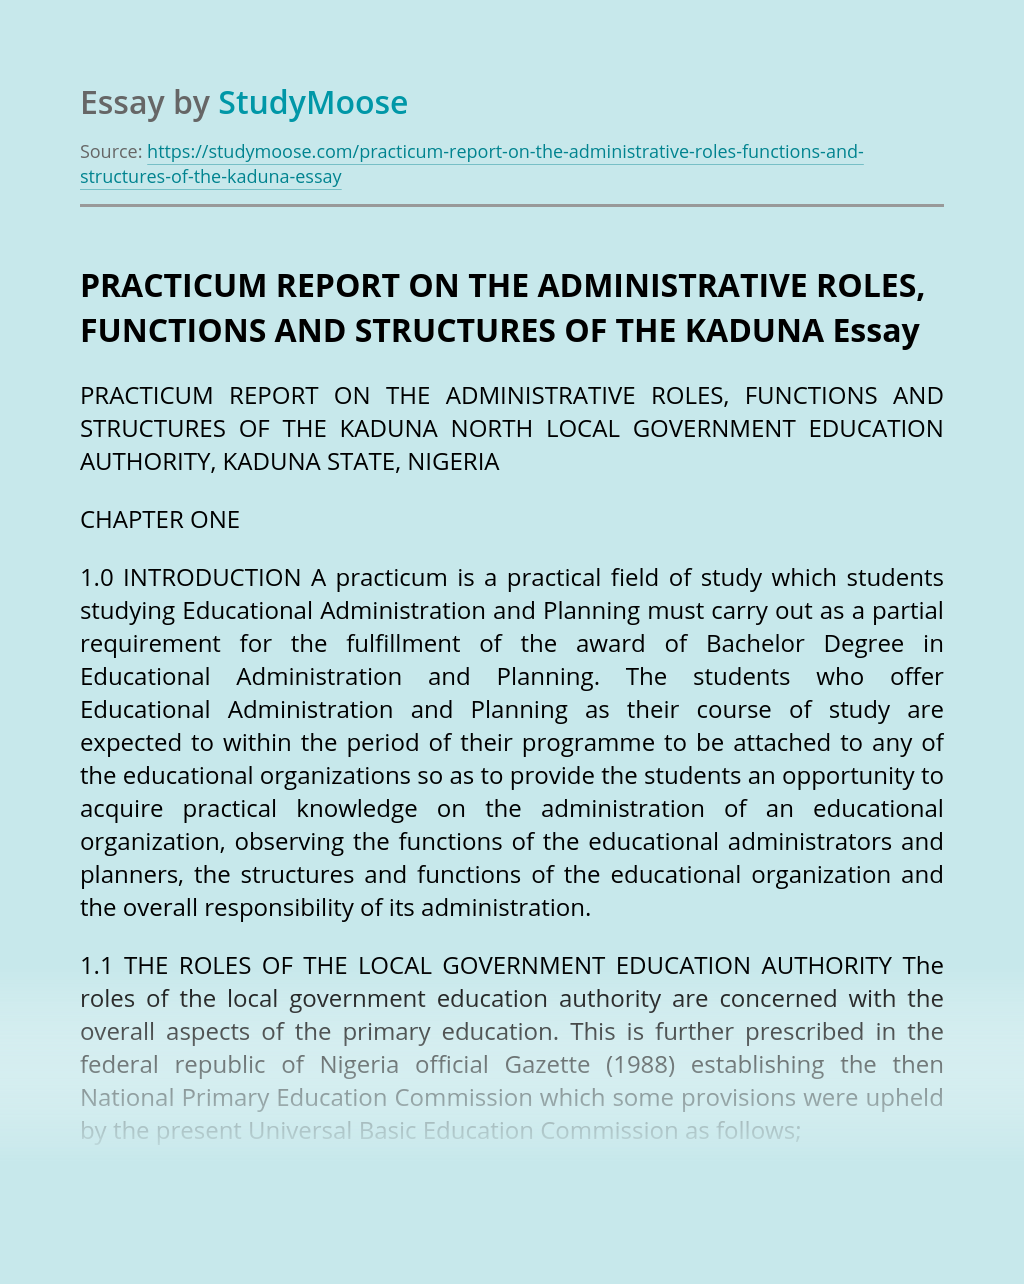 The Kaduna North Local Government Education Authority, Kaduna State, Nigeria